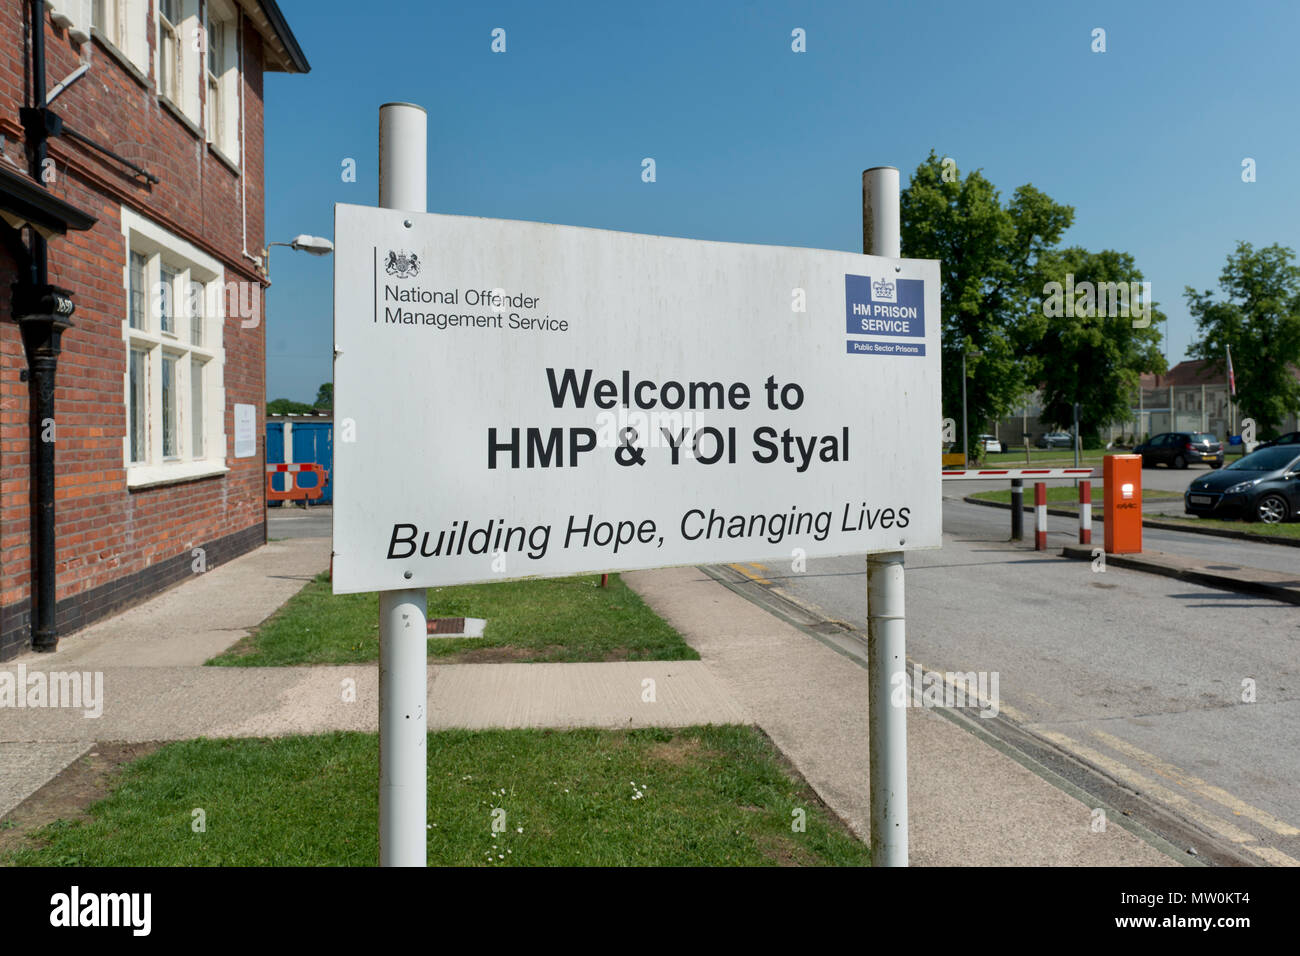 Signage outside HM Prison Styal in Cheshire, UK - Stock Image